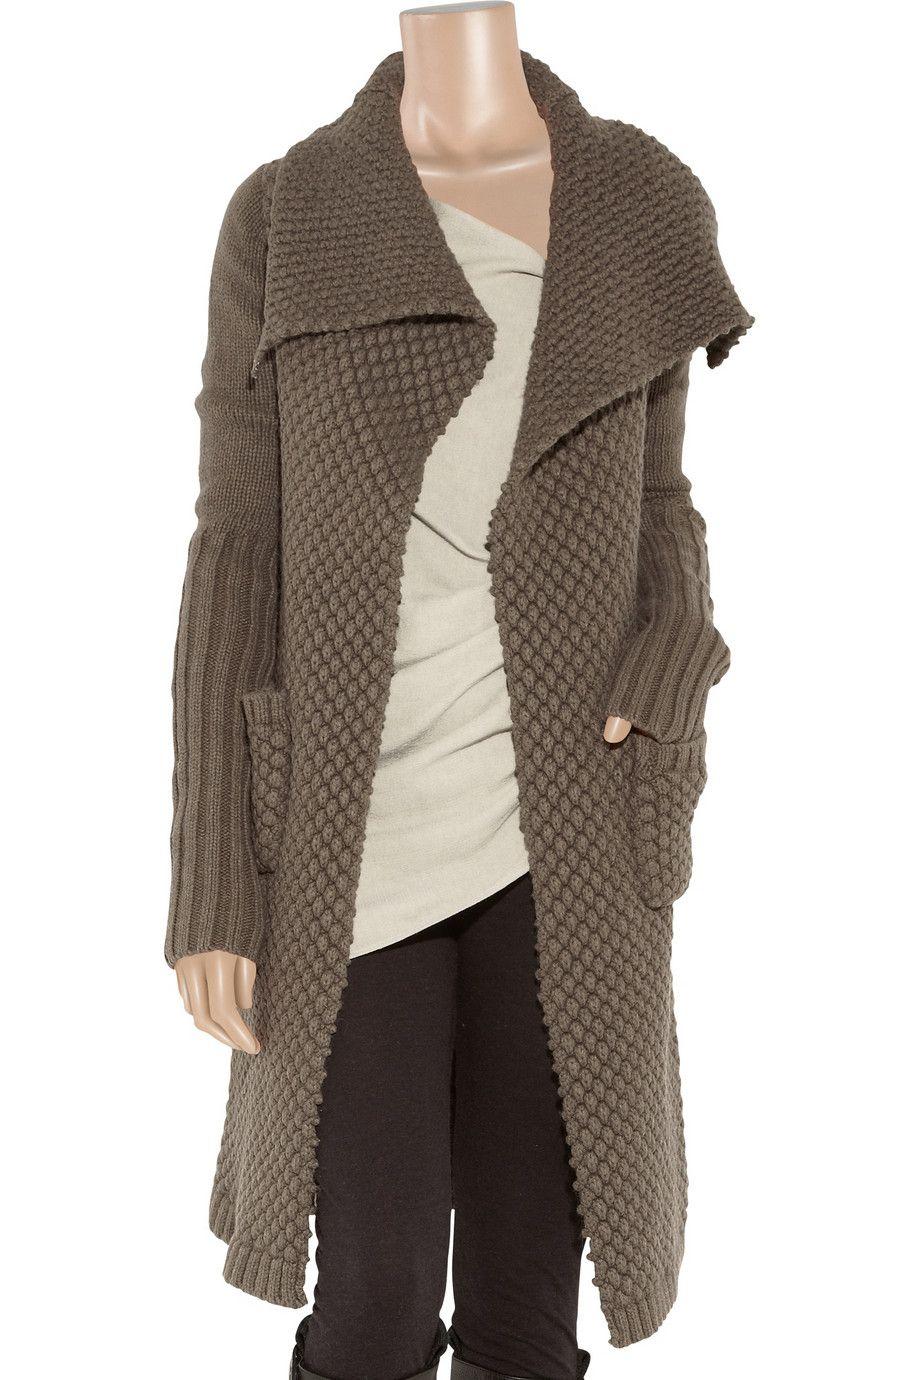 Alpaca and silk-blend cardi-coat by Rick Owens - a beautiful dream ...